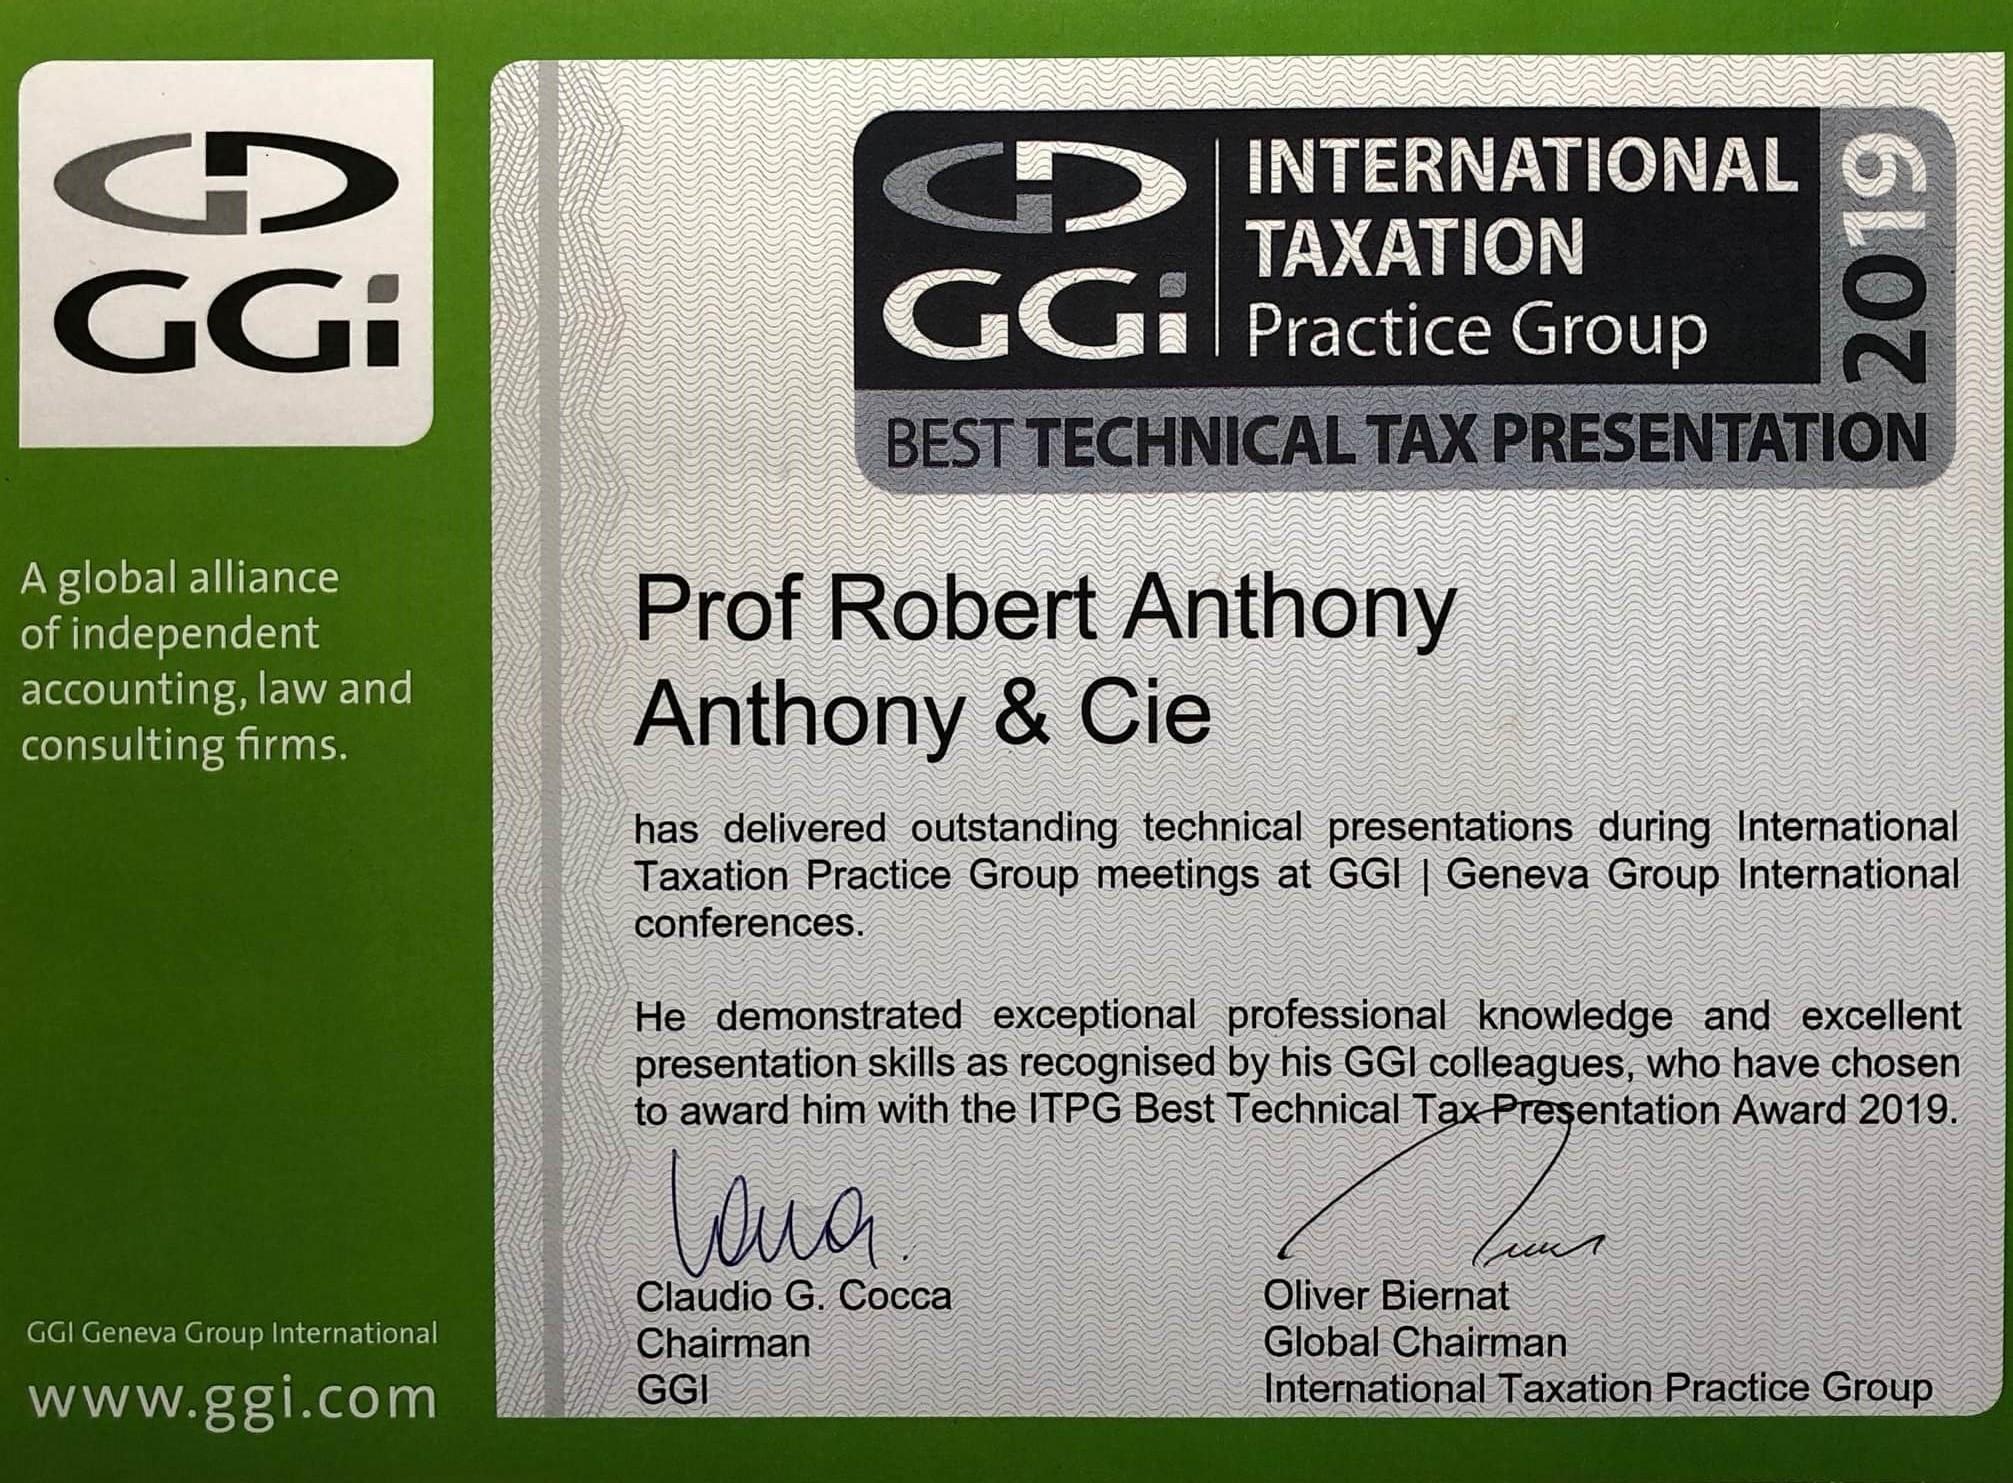 GGI Best Technical Tax Presentation 2019